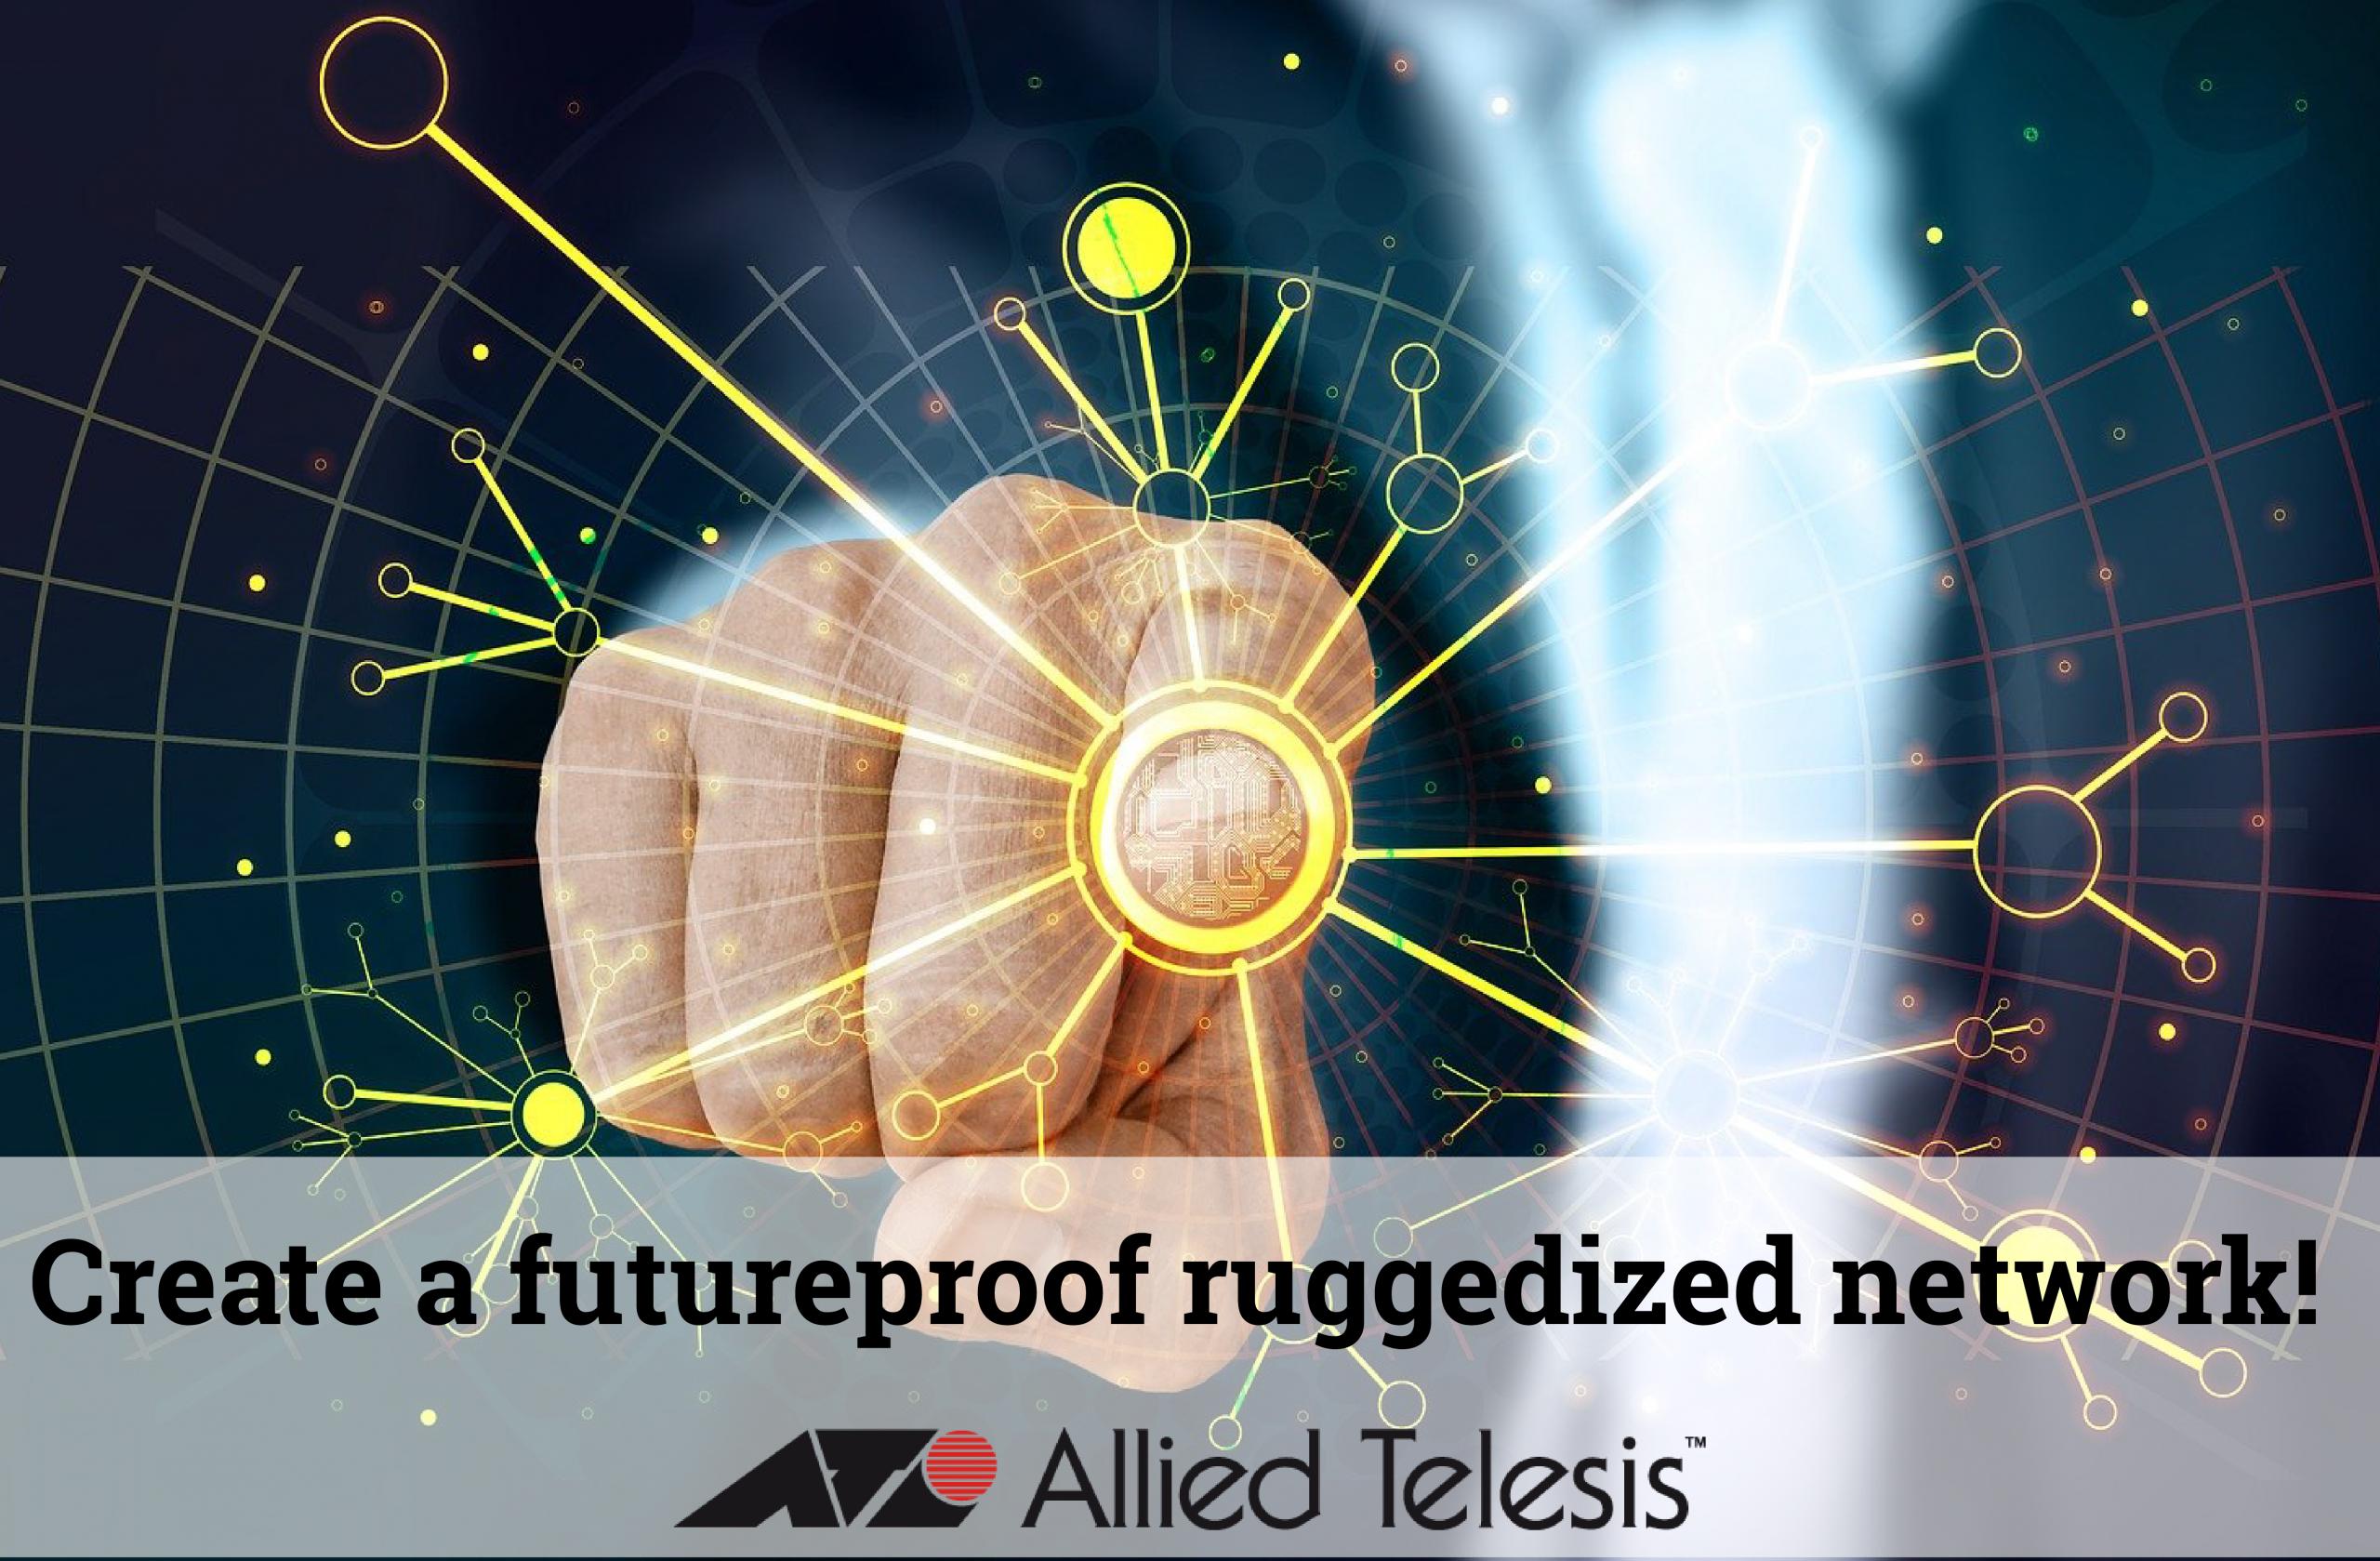 Ruggedized Futureproof network - allied telesis